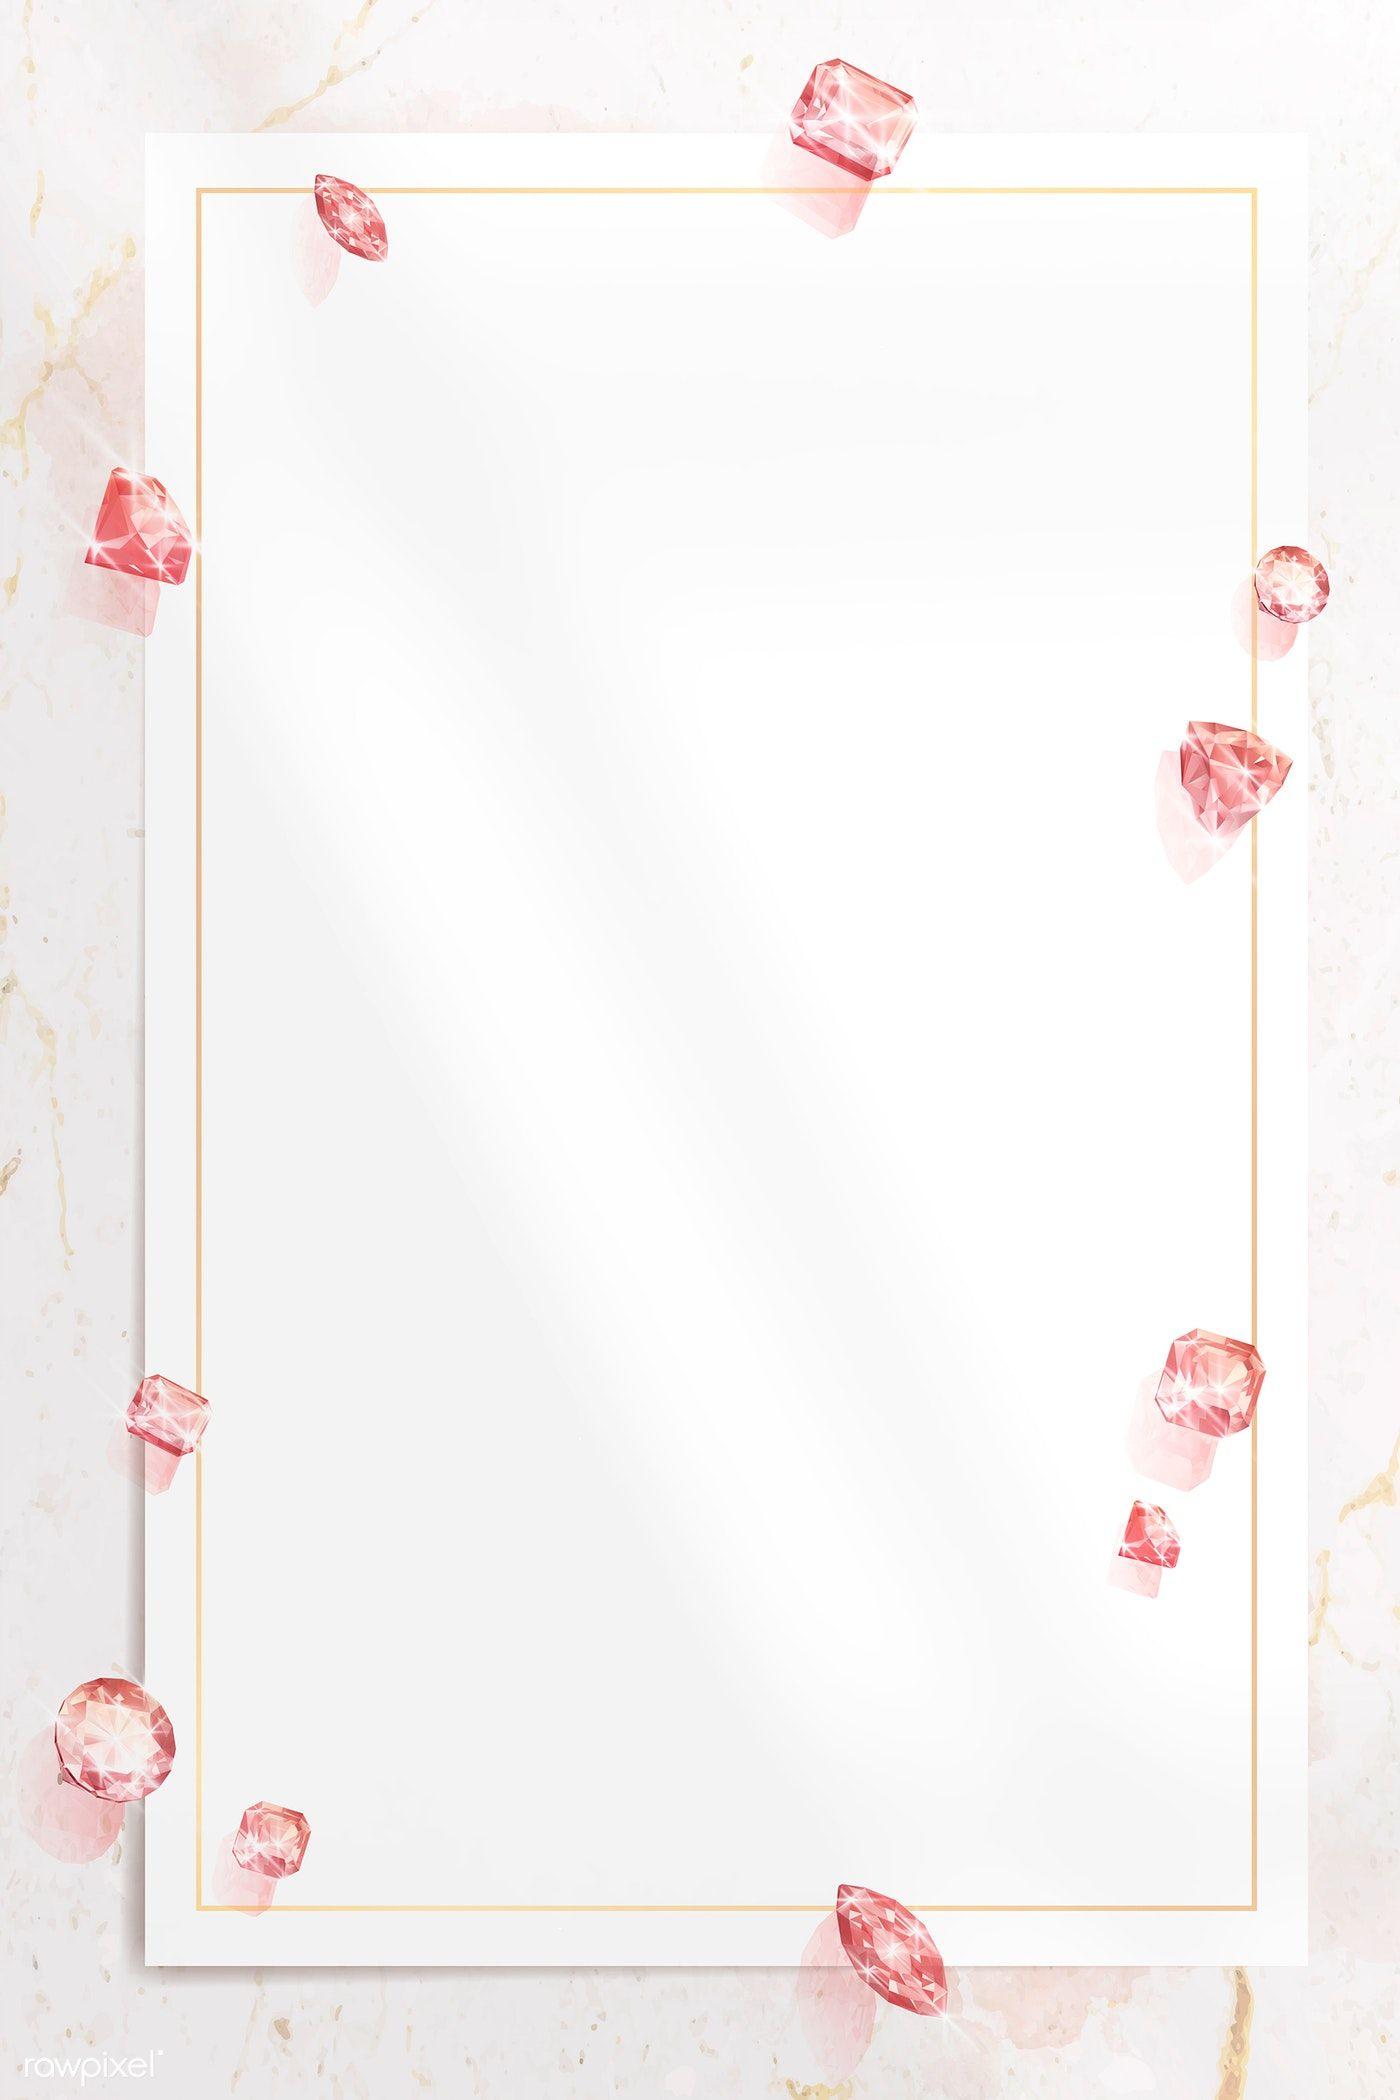 Download Premium Vector Of Pink Crystal Gem Design Vector 1228090 Pink Crystal Flower Background Wallpaper Pink Diamond